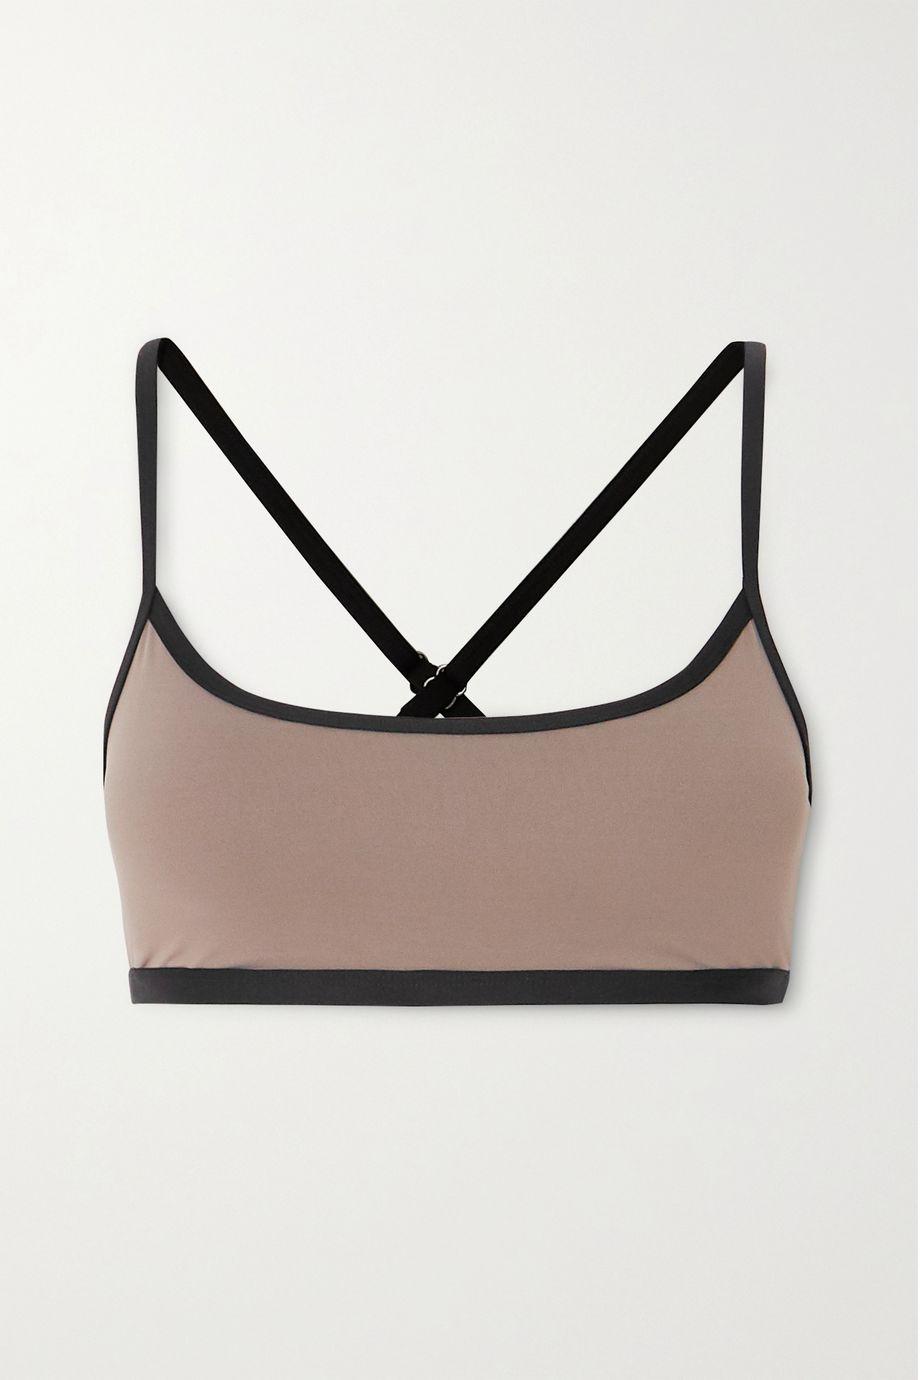 Ernest Leoty Daphne paneled stretch sports bra